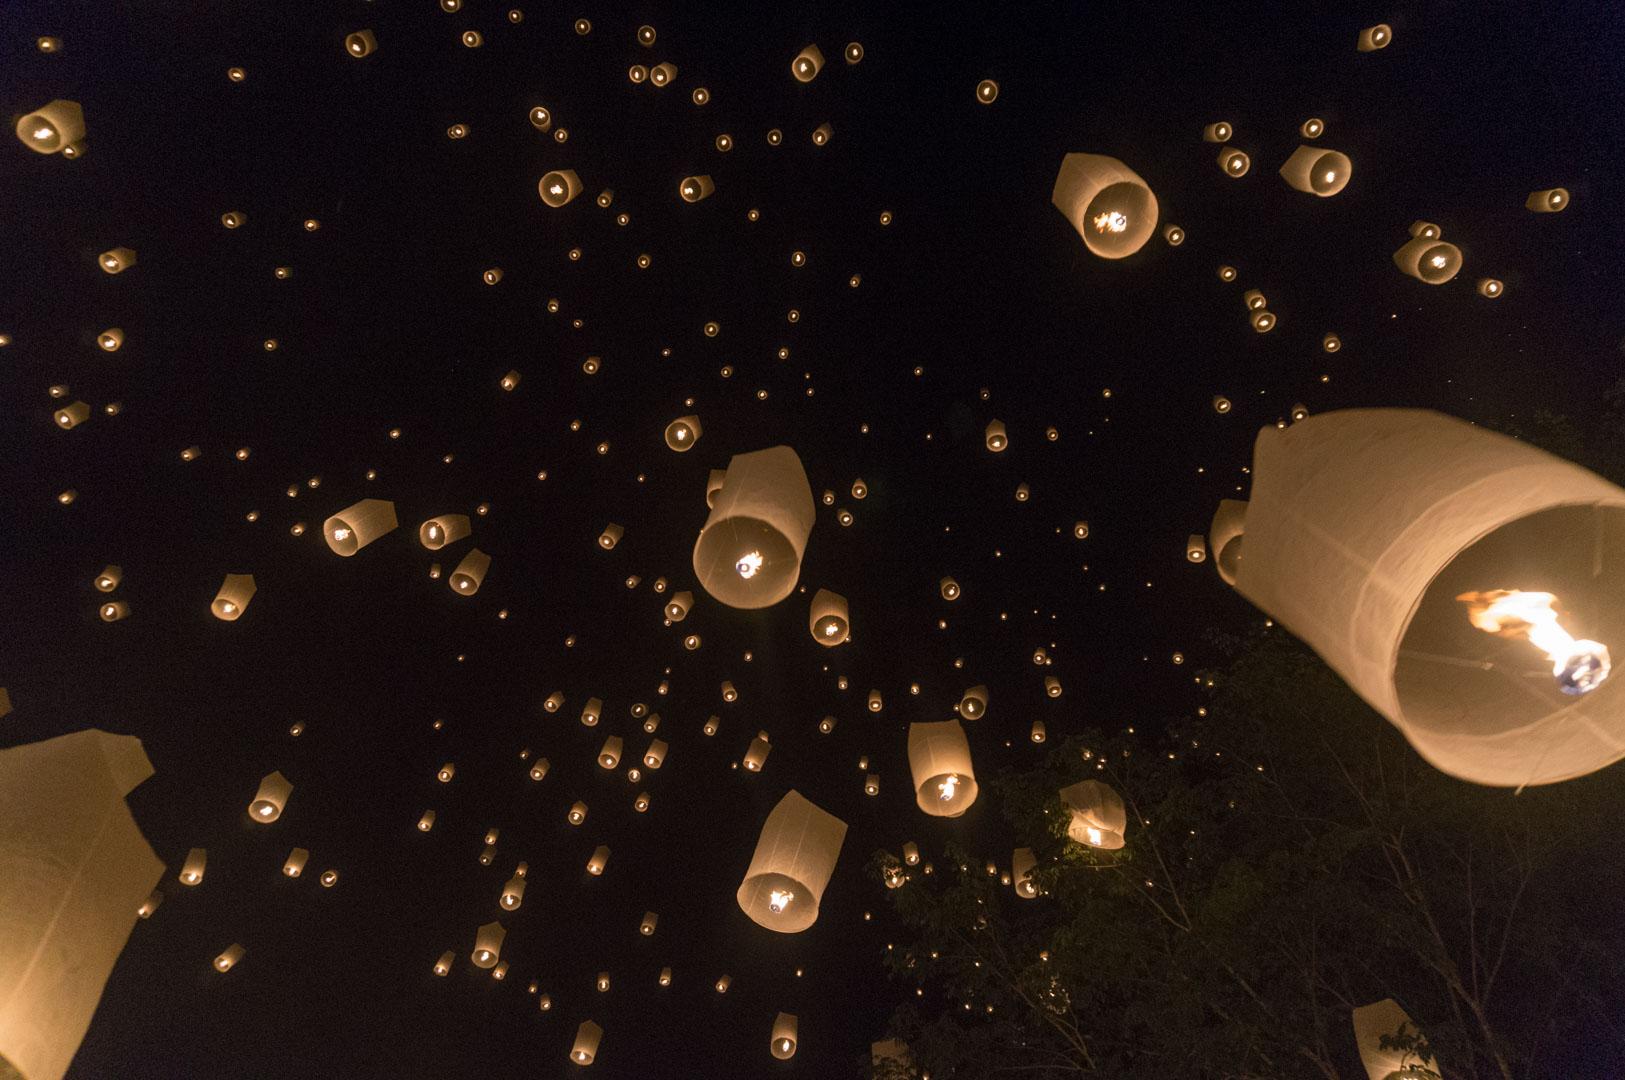 Der Himmel voller Lampignons